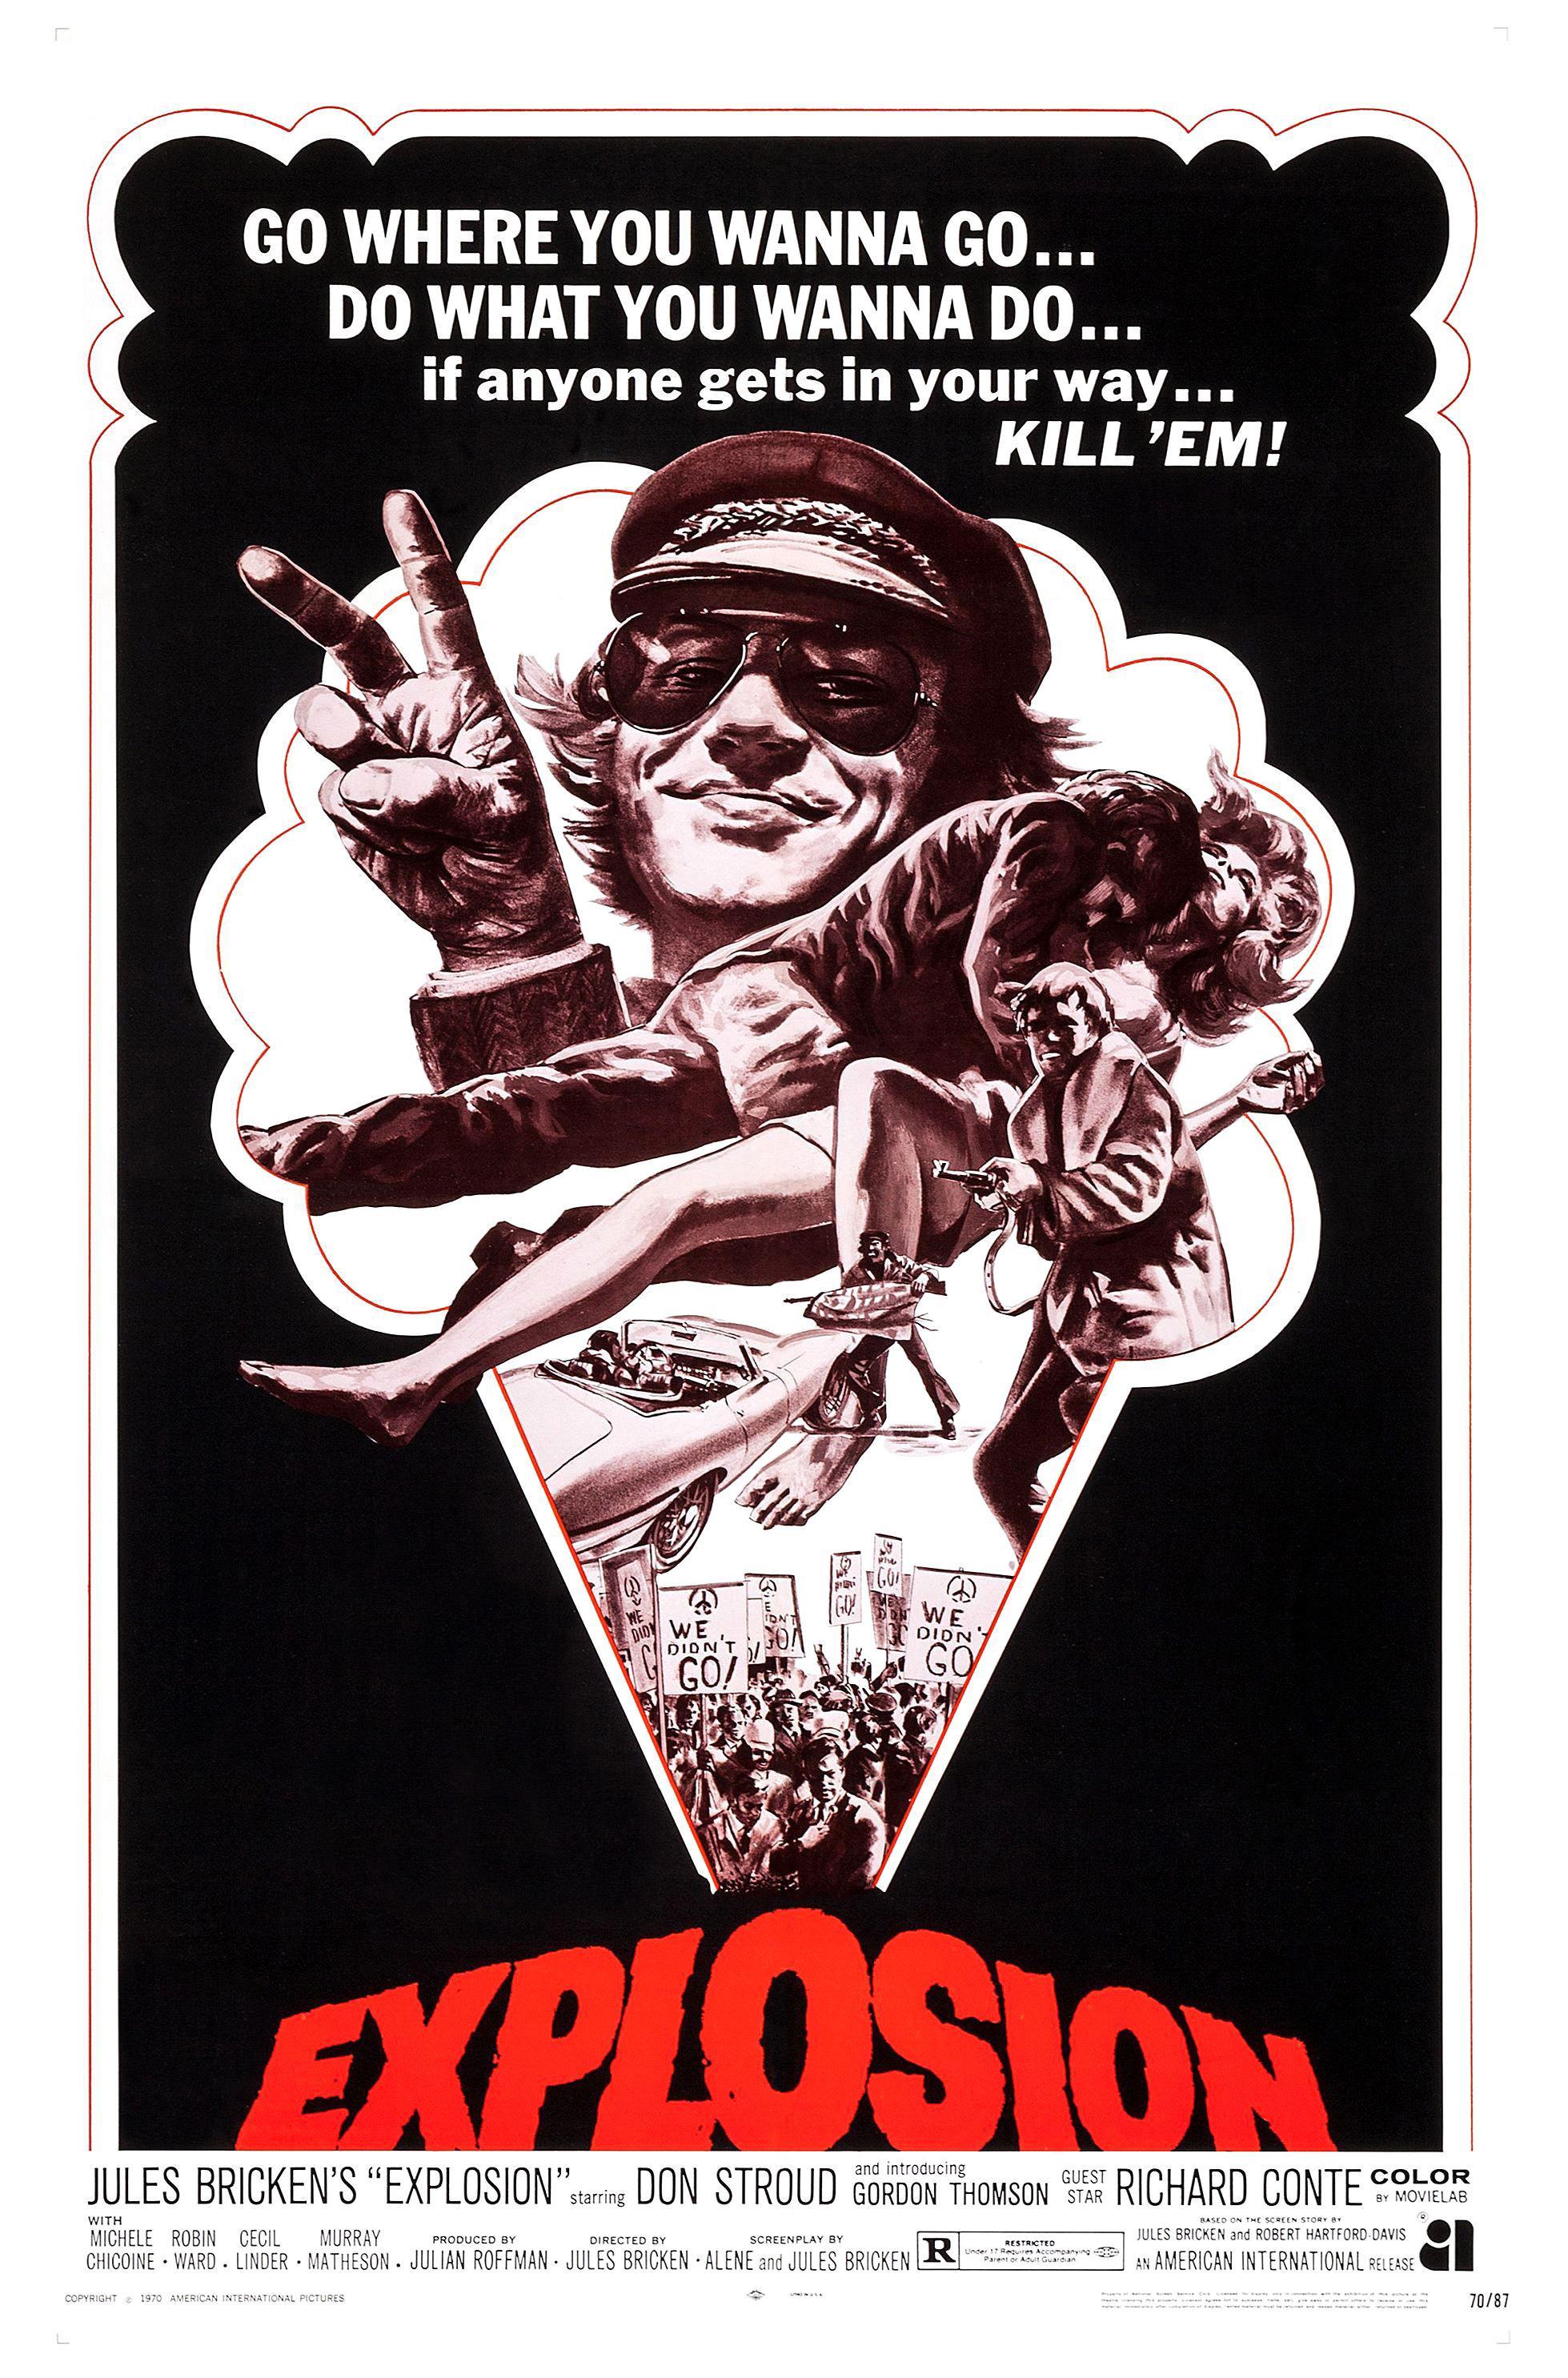 Explosion (1969)